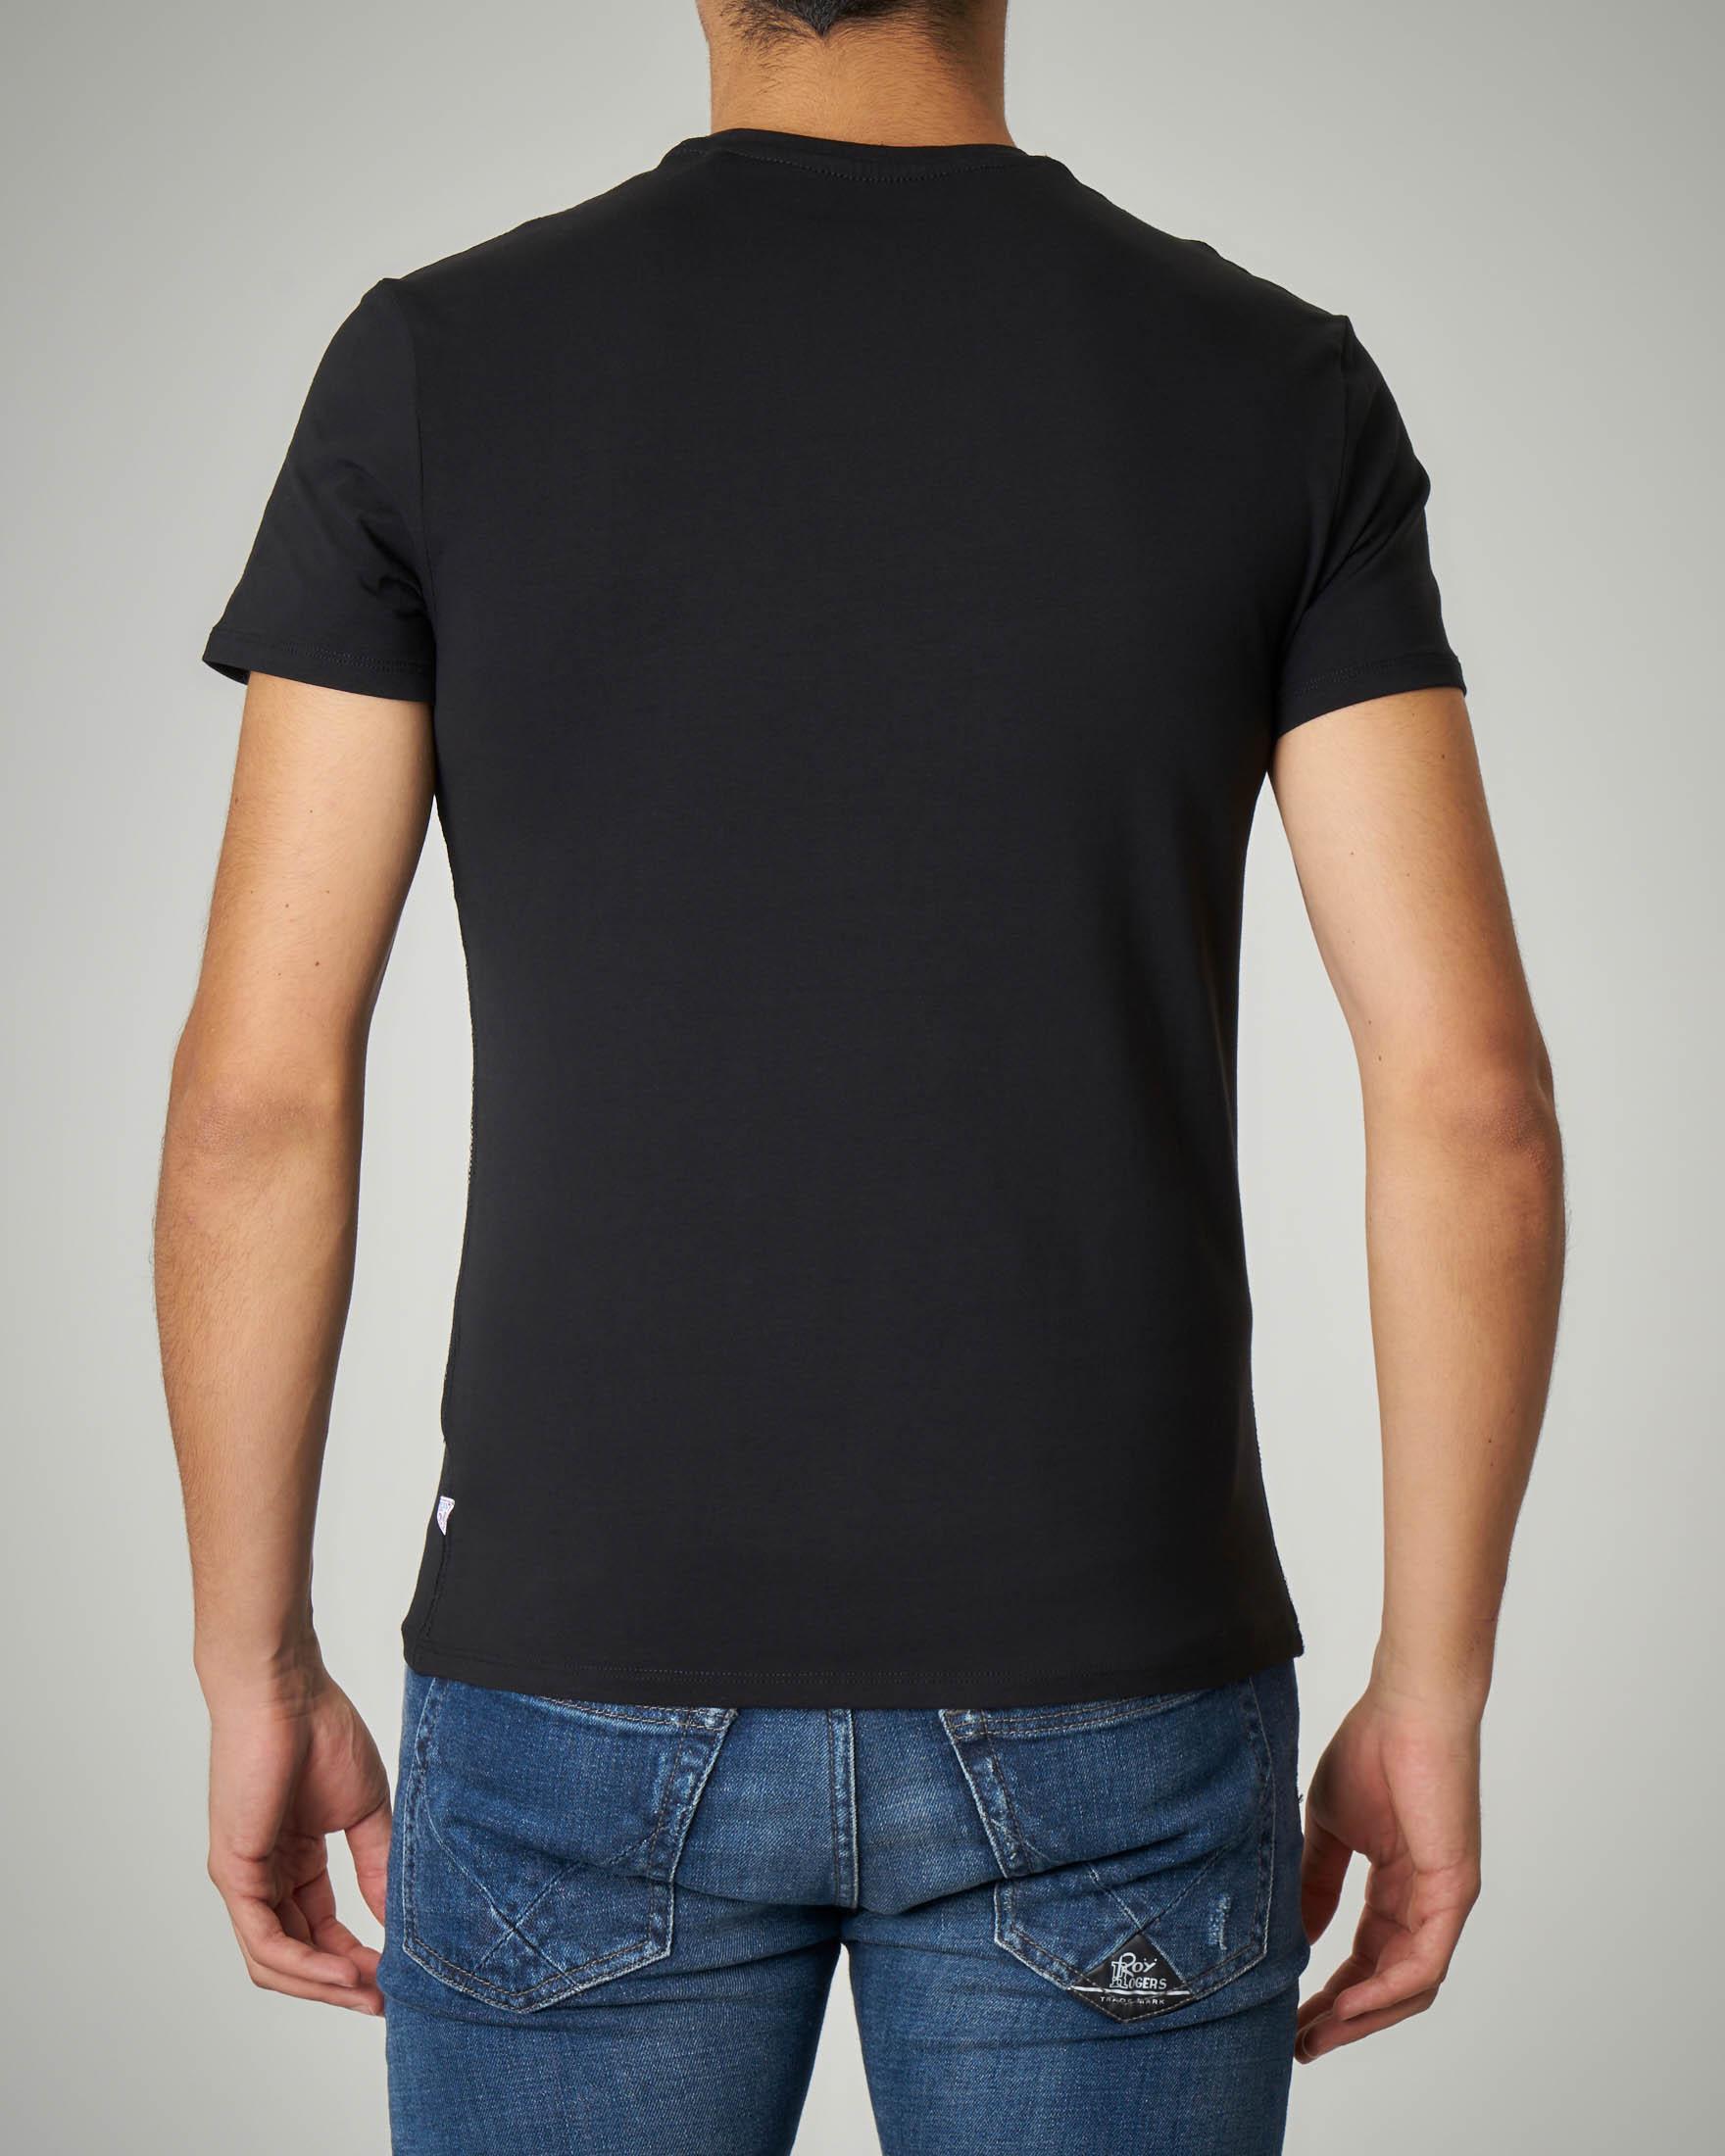 T-shirt nera con logo effetto denim